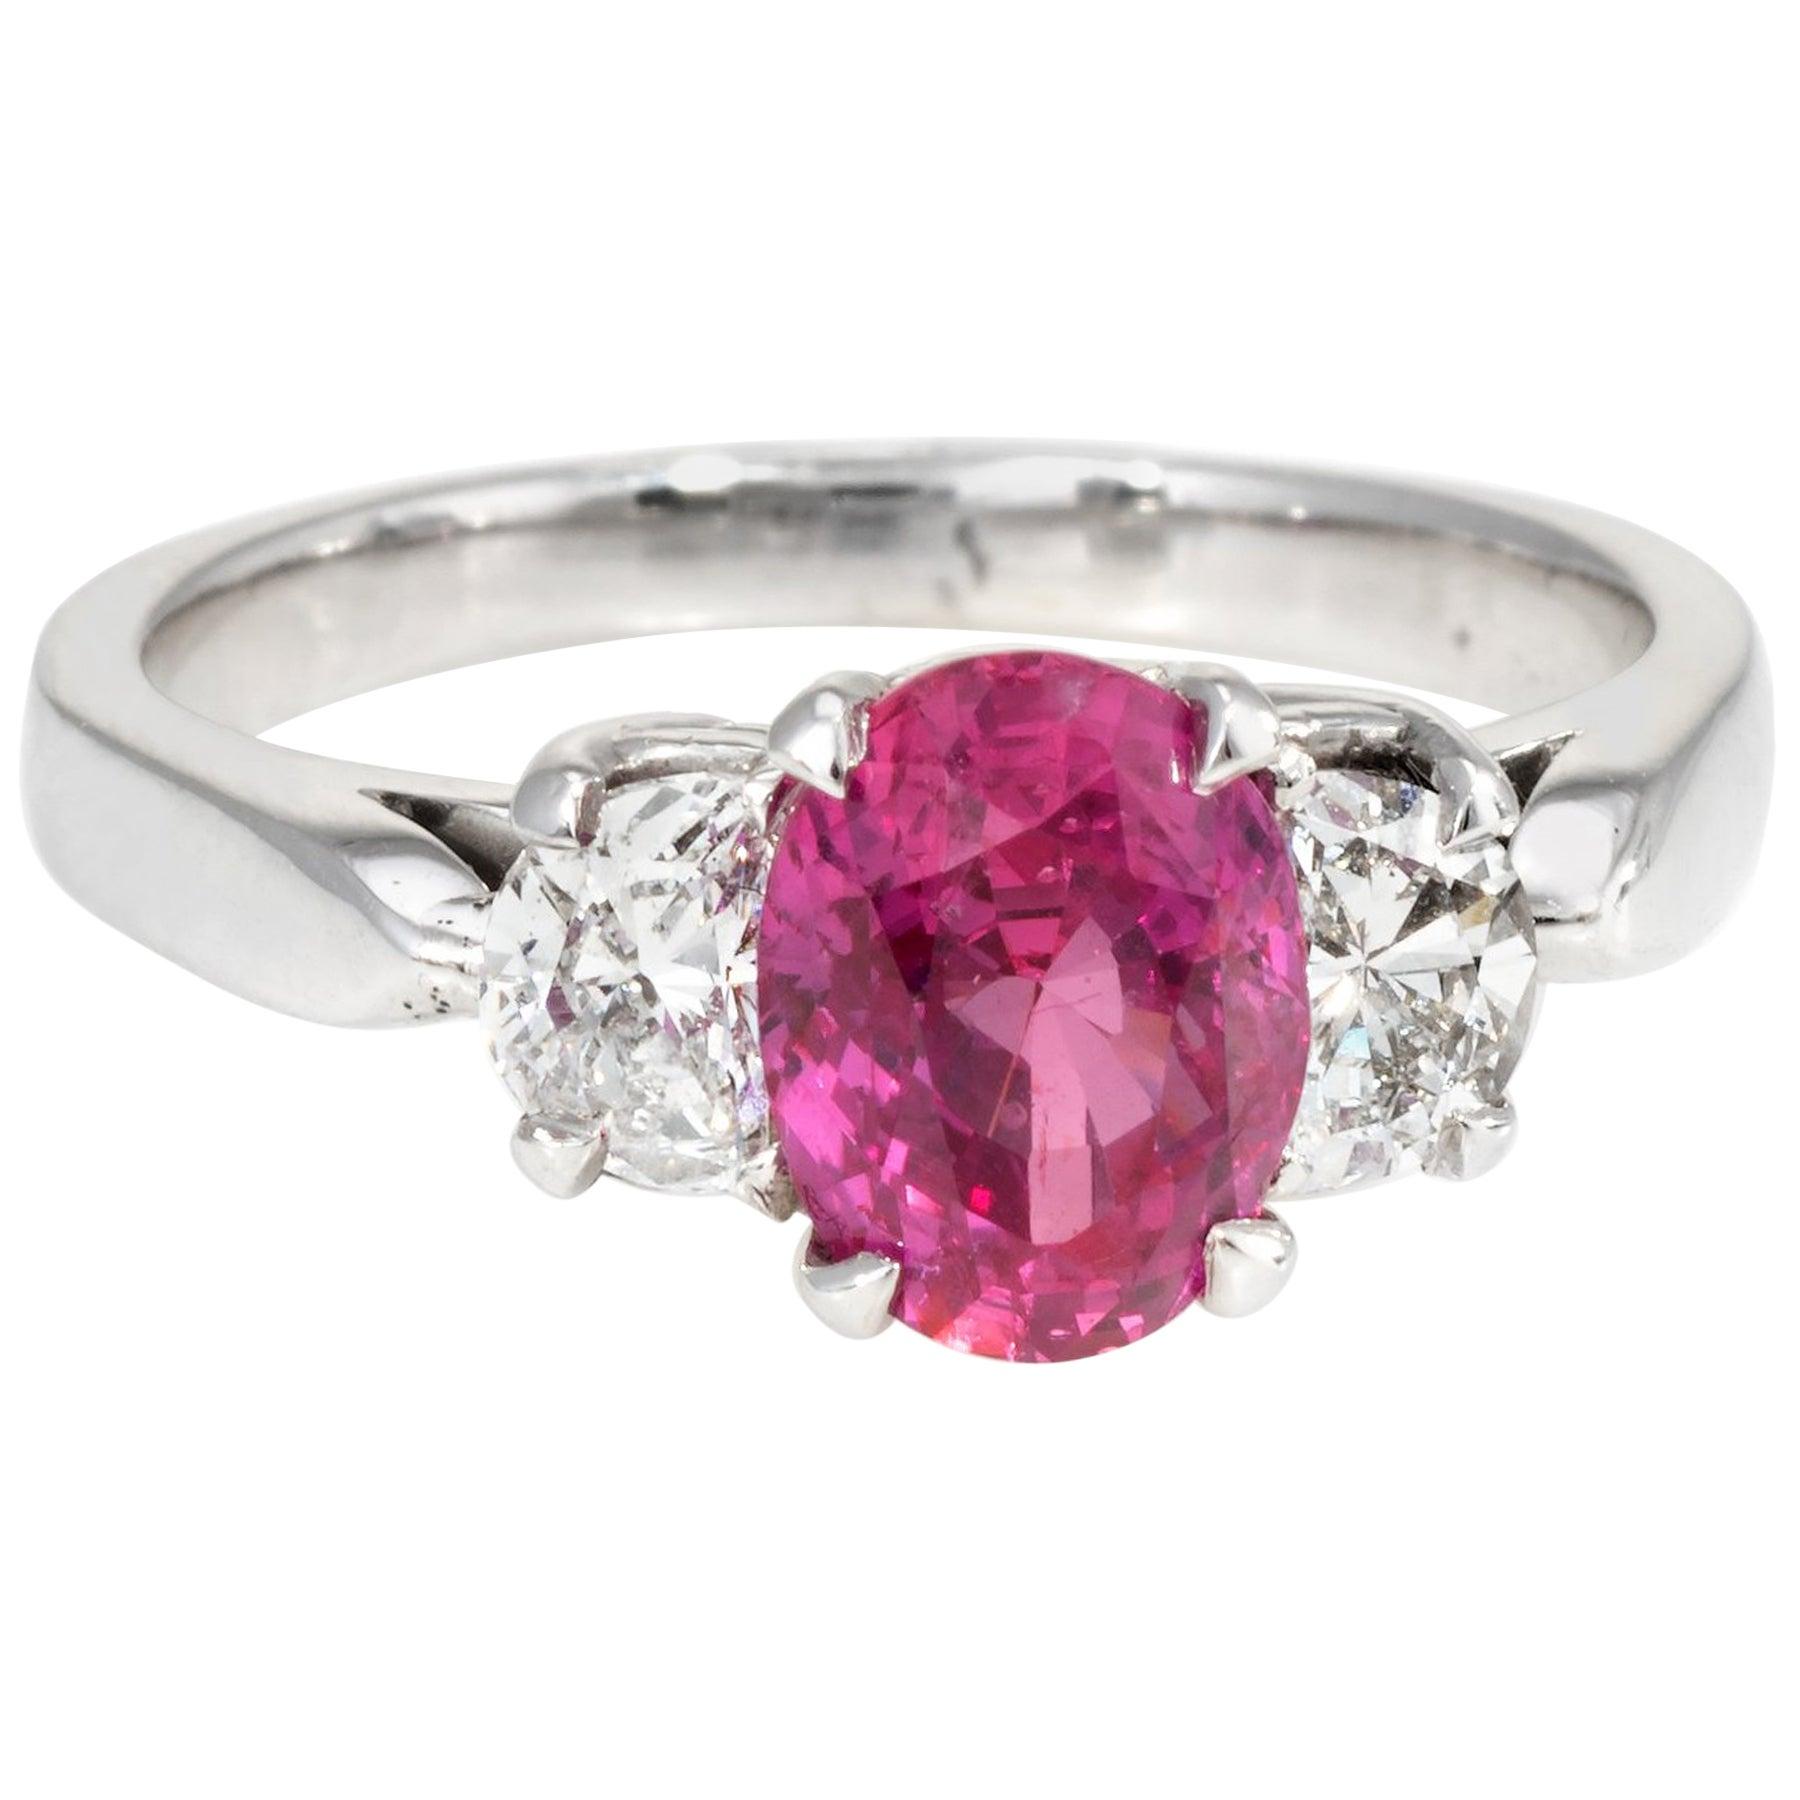 14 Karat White Gold Diamond Engagement Ring For Sale at 1stdibs